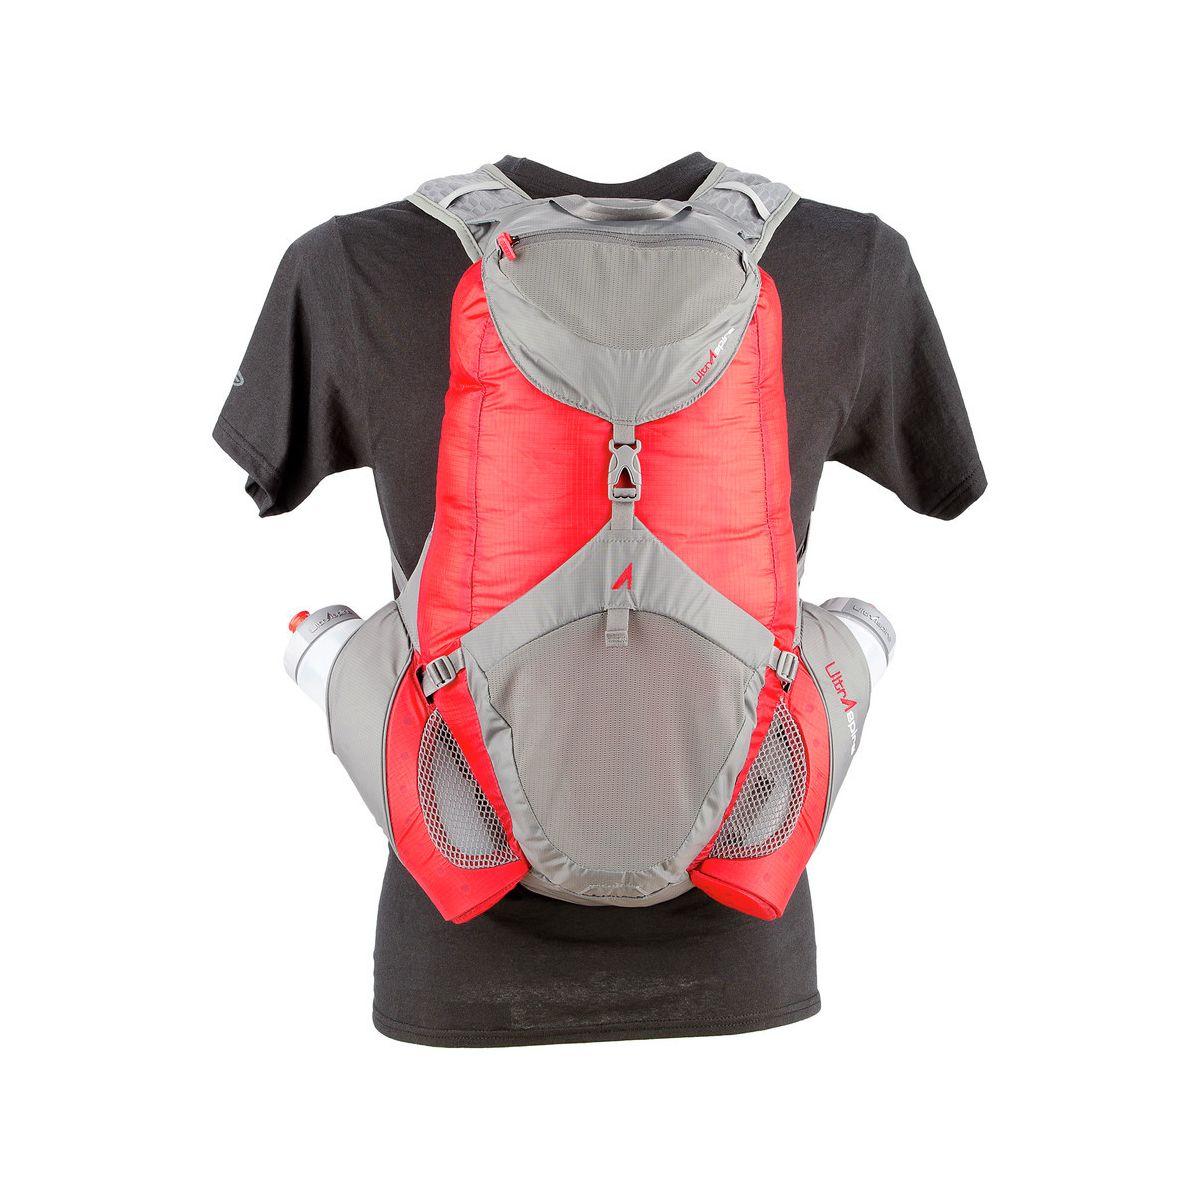 UltrAspire Fastpack Race Vest